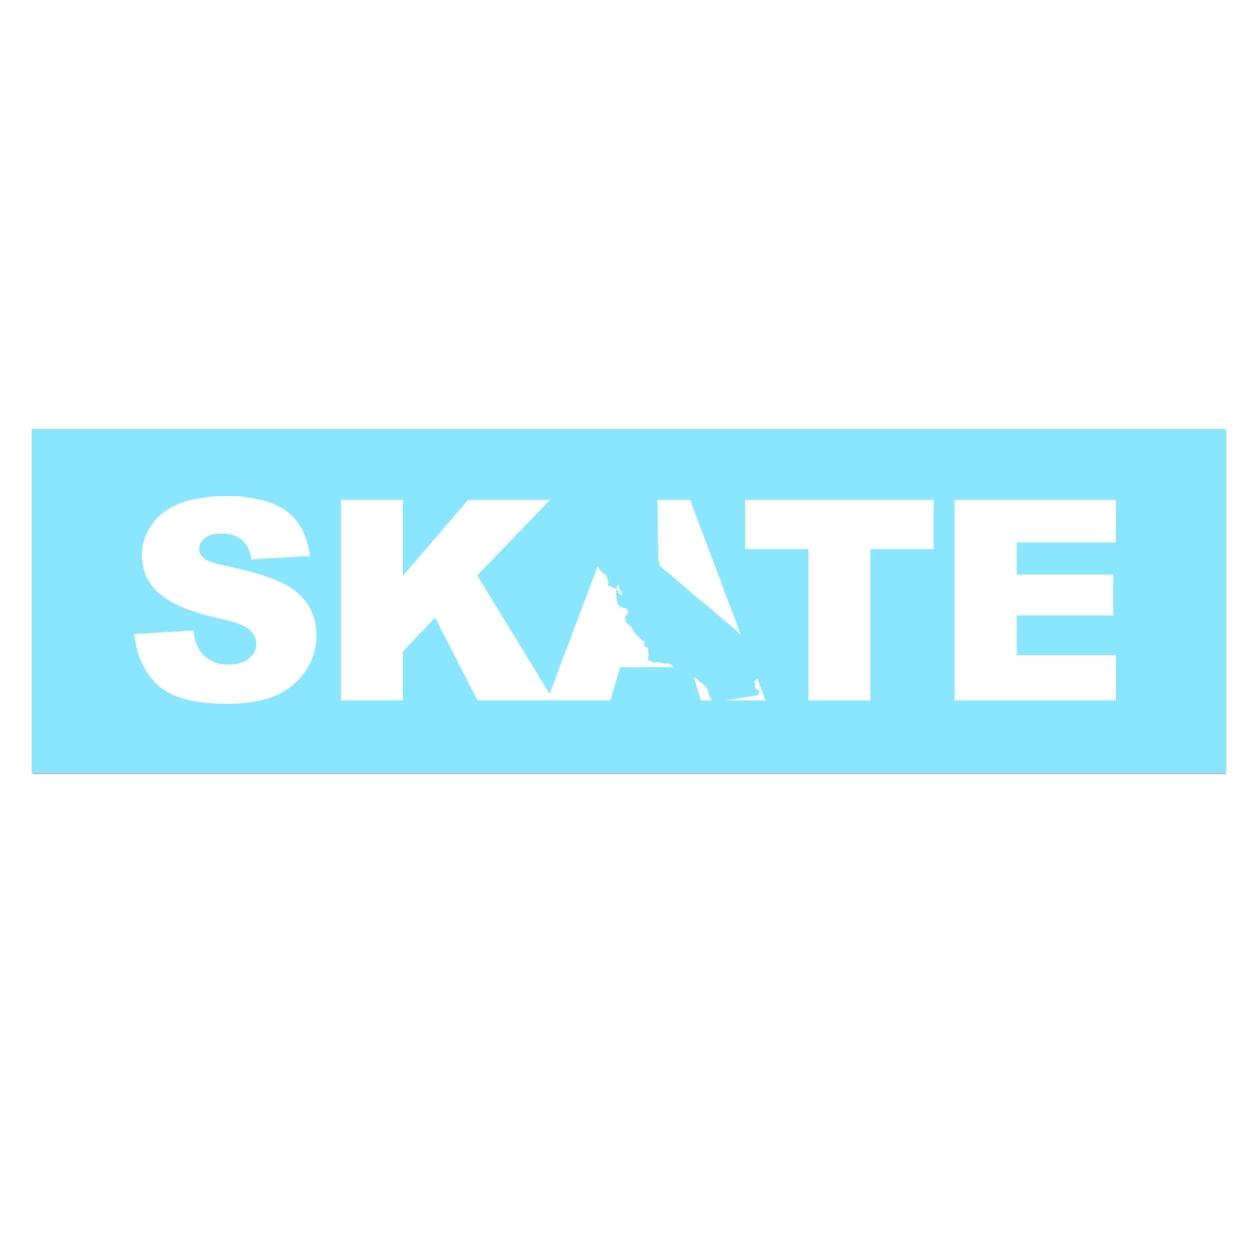 Skate California Classic Decal (White Logo)